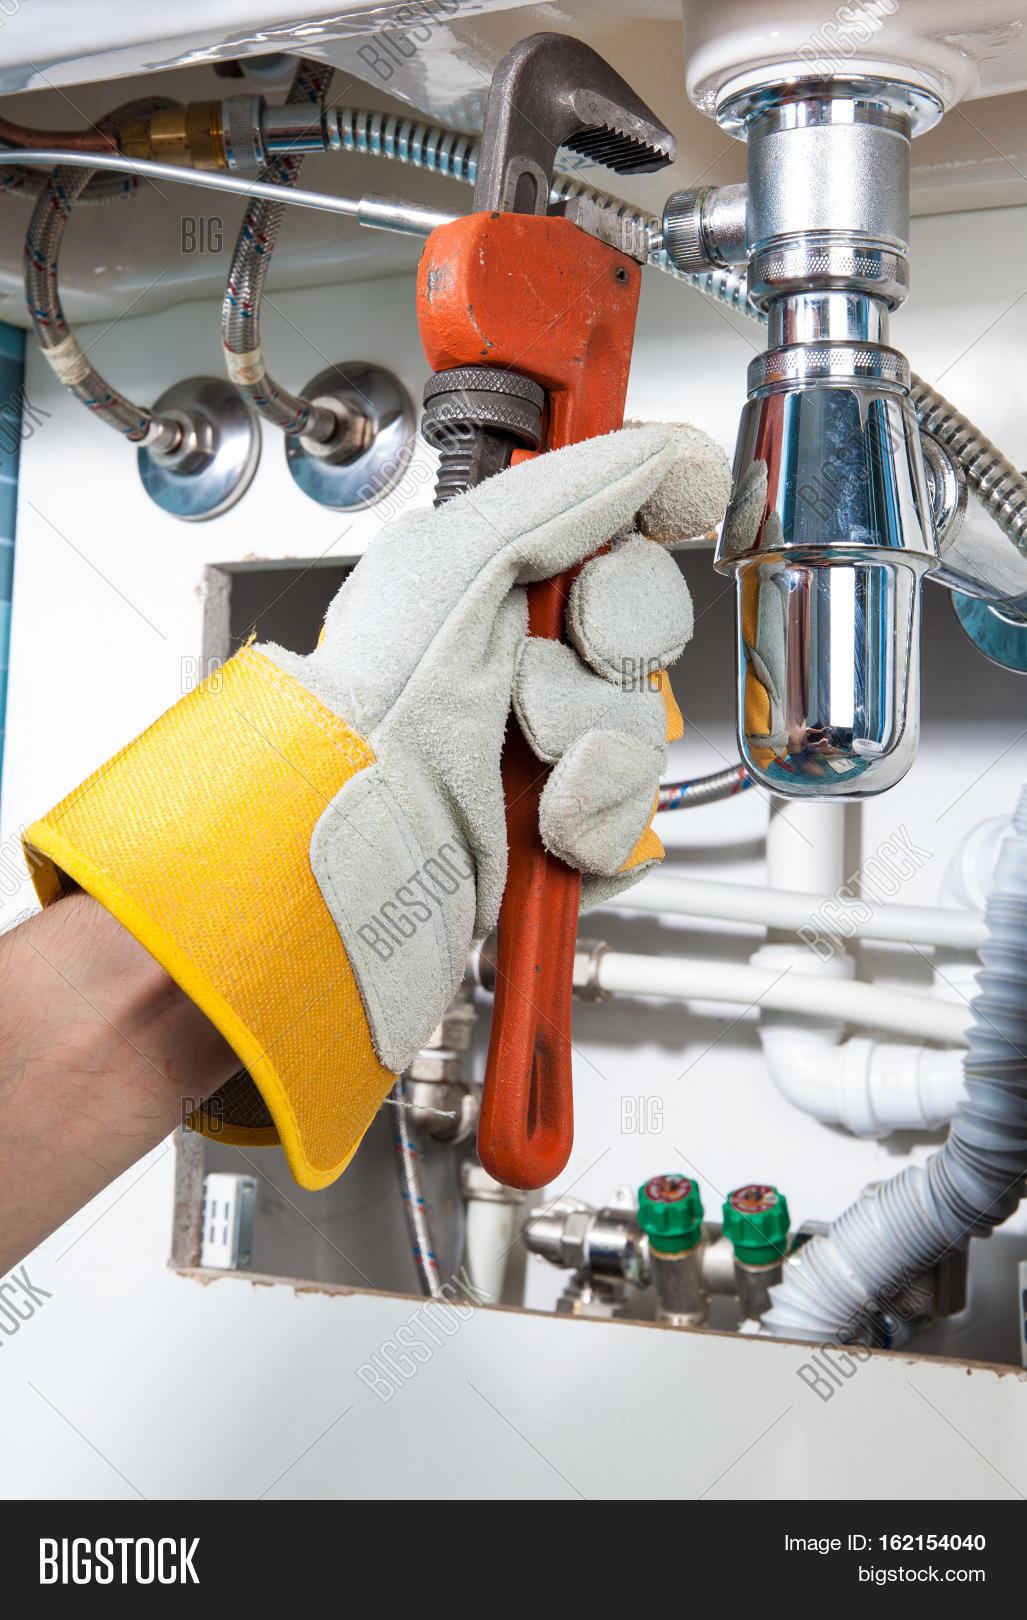 Plumbing Work Sanitary Engineering Image & Photo | Bigstock